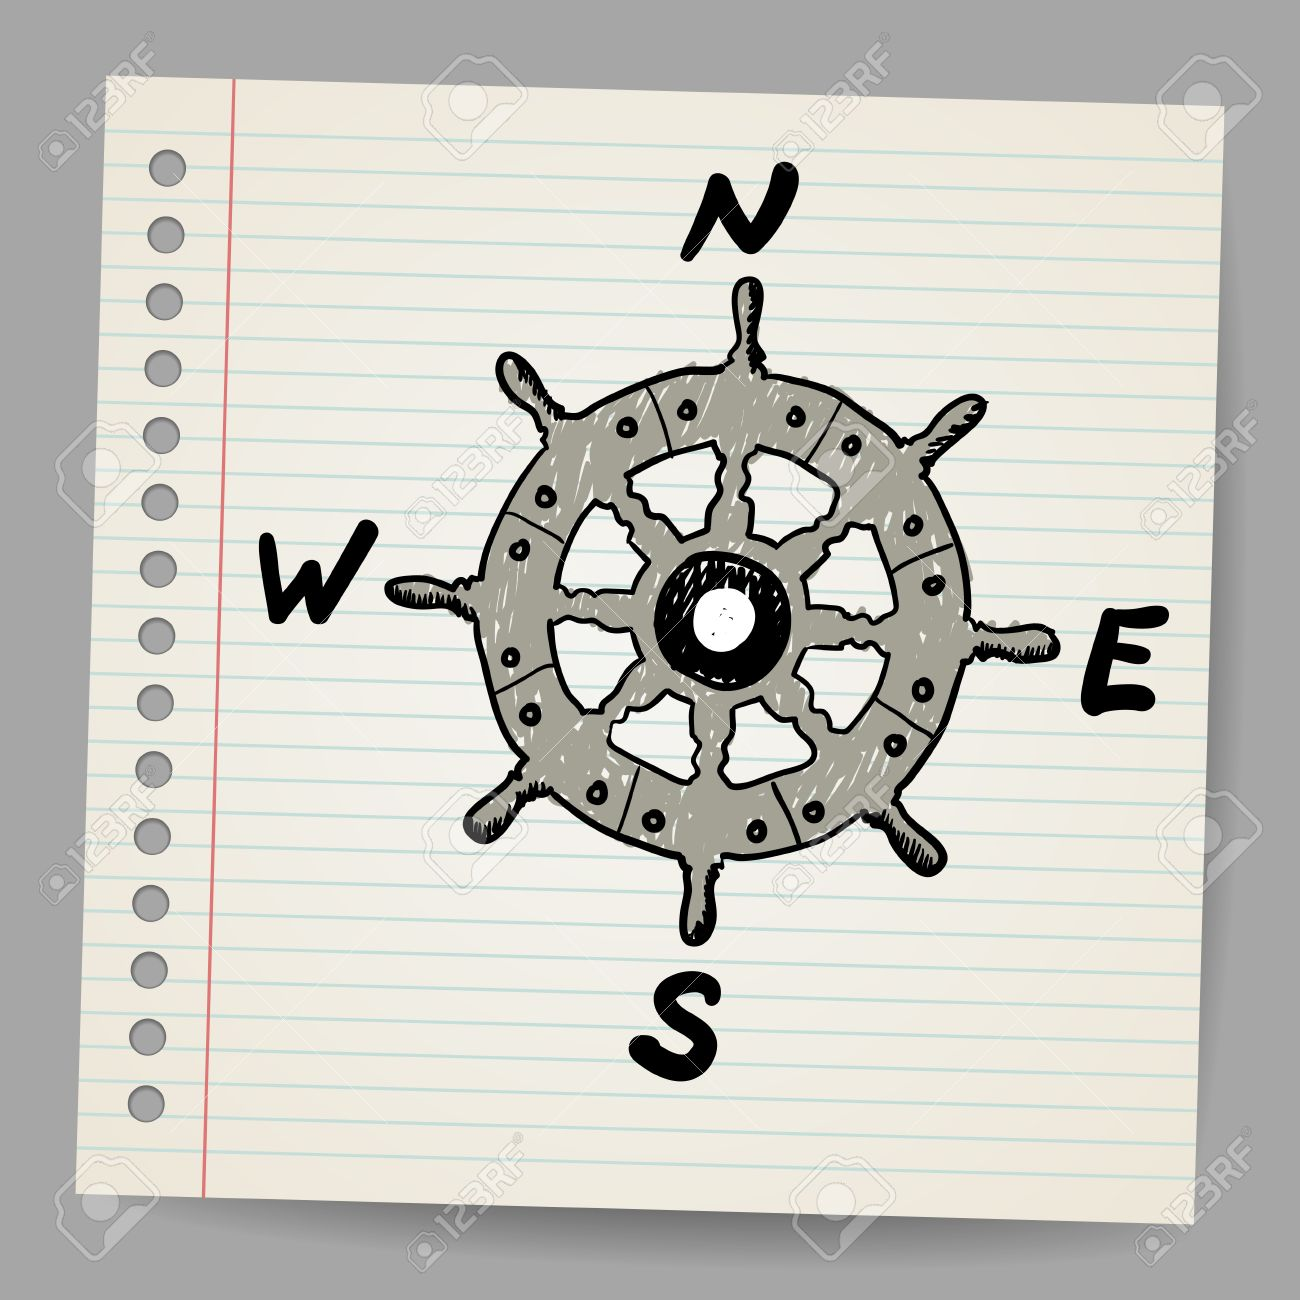 Doodle steering control-compass sketch concept Stock Vector - 16989487